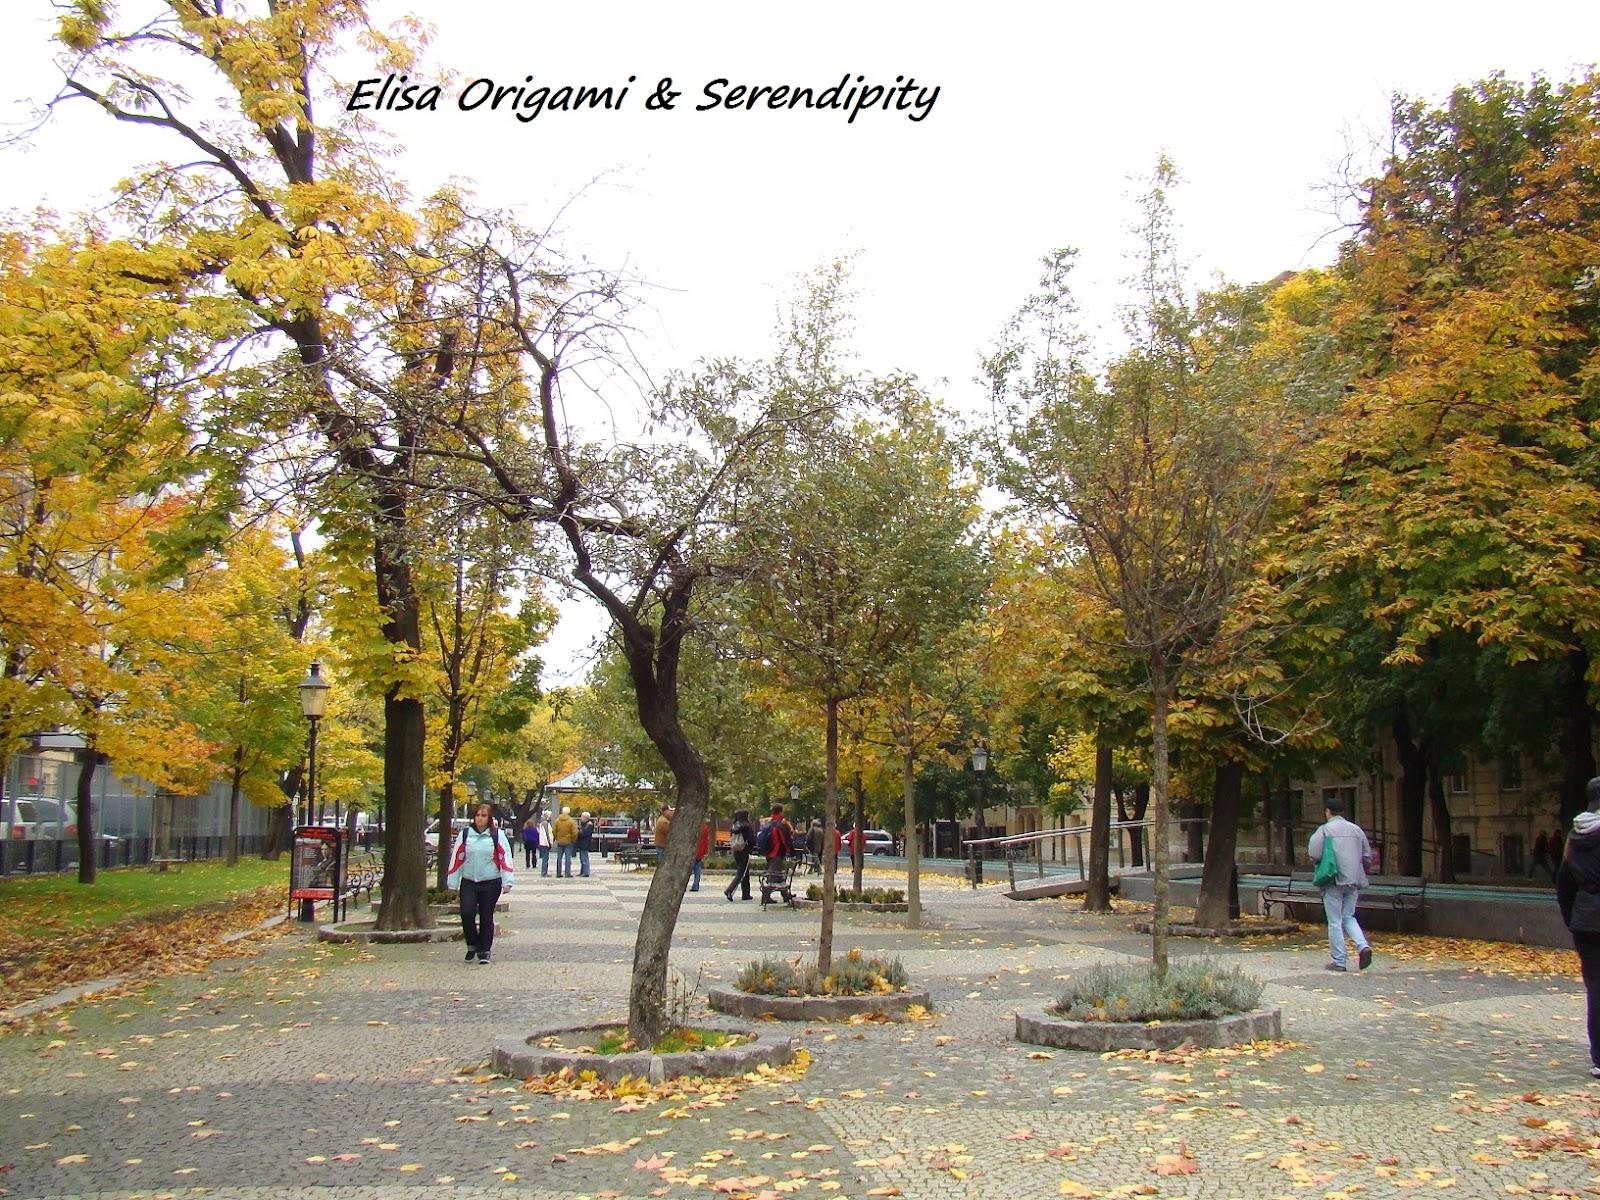 Plaza Hviezdoslav, Bratislava, Elisa N, Blog de Viajes, Lifestyle, Travel